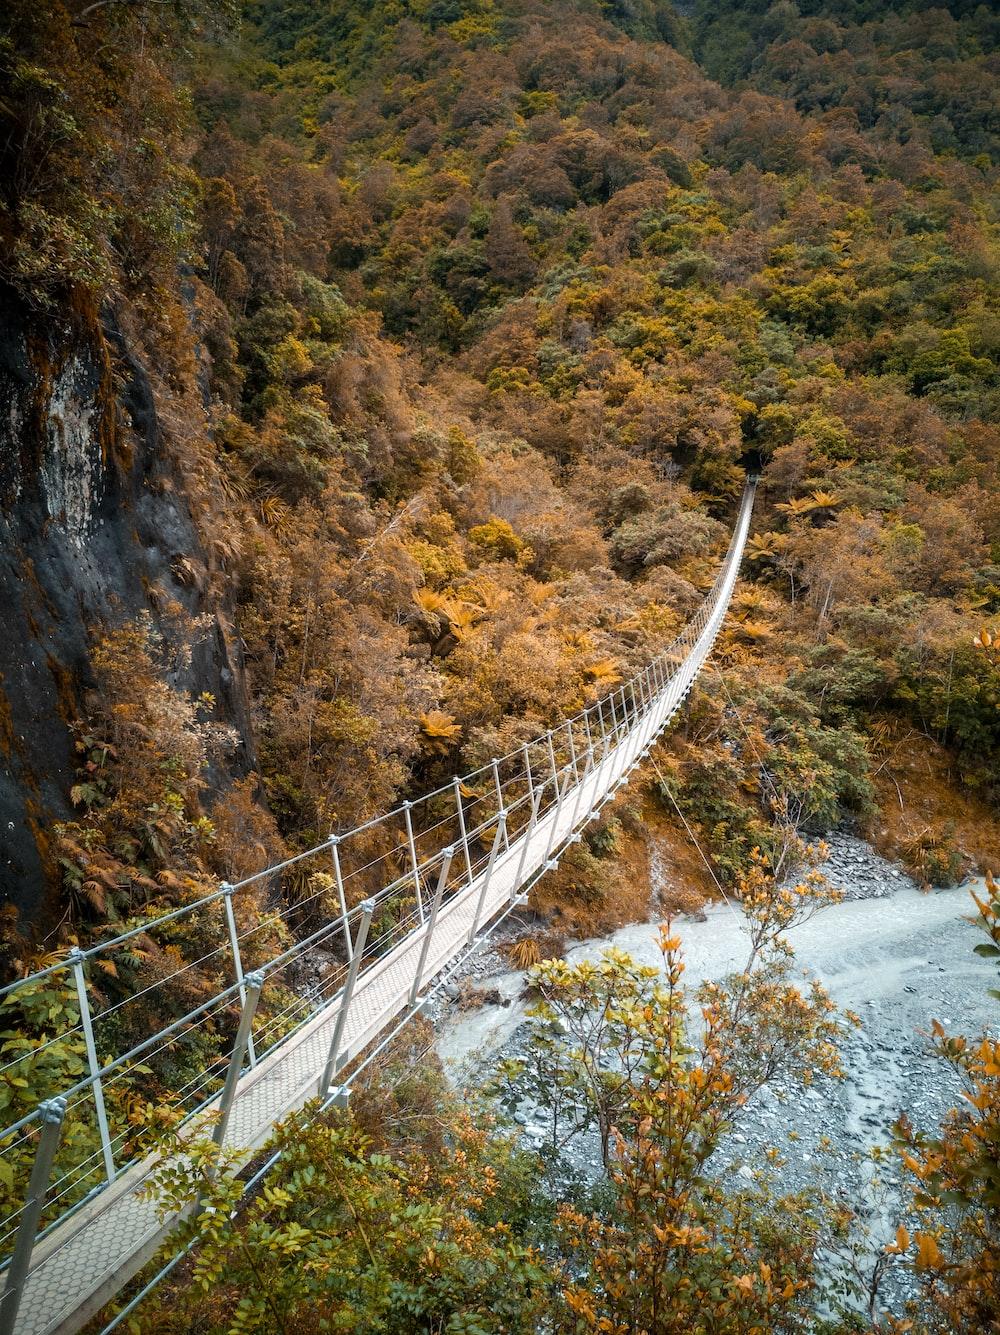 white bridge over river between trees